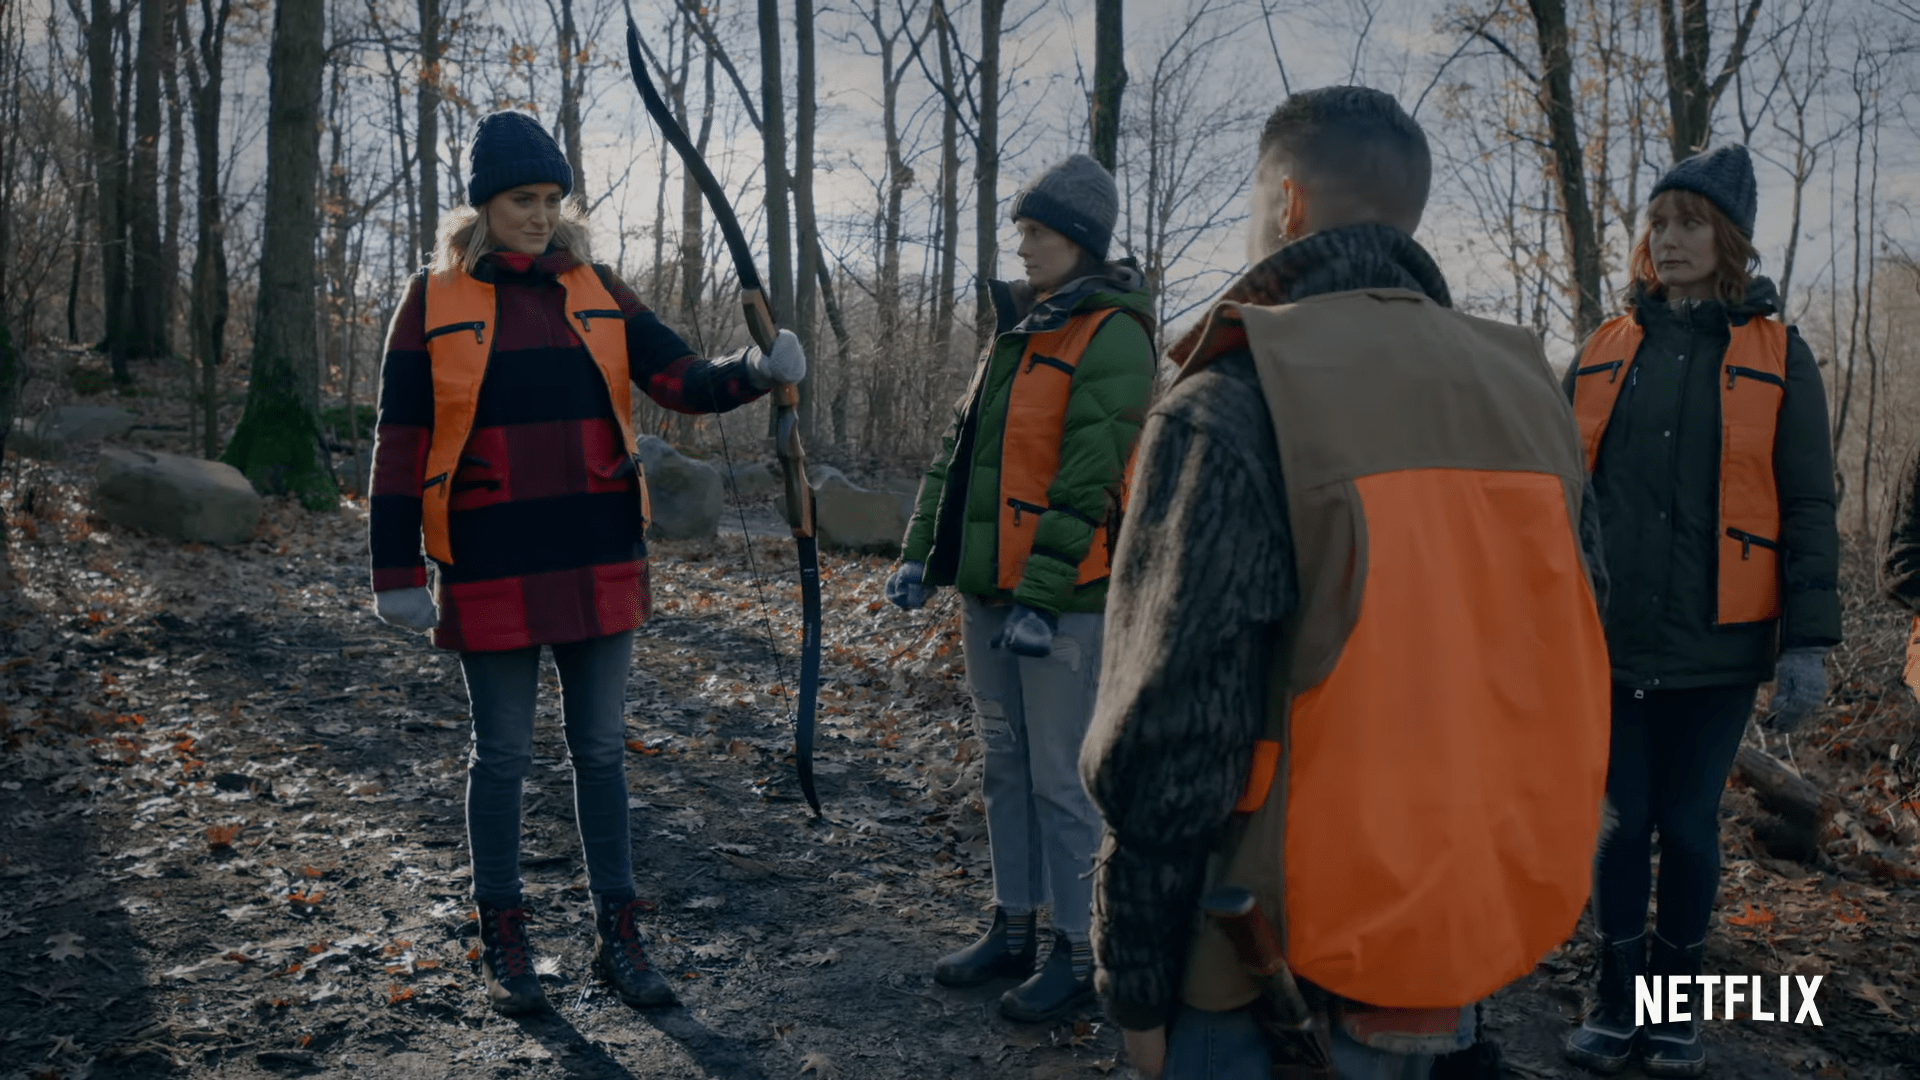 'Orange is the New Black' trailer previews its final season on Netflix